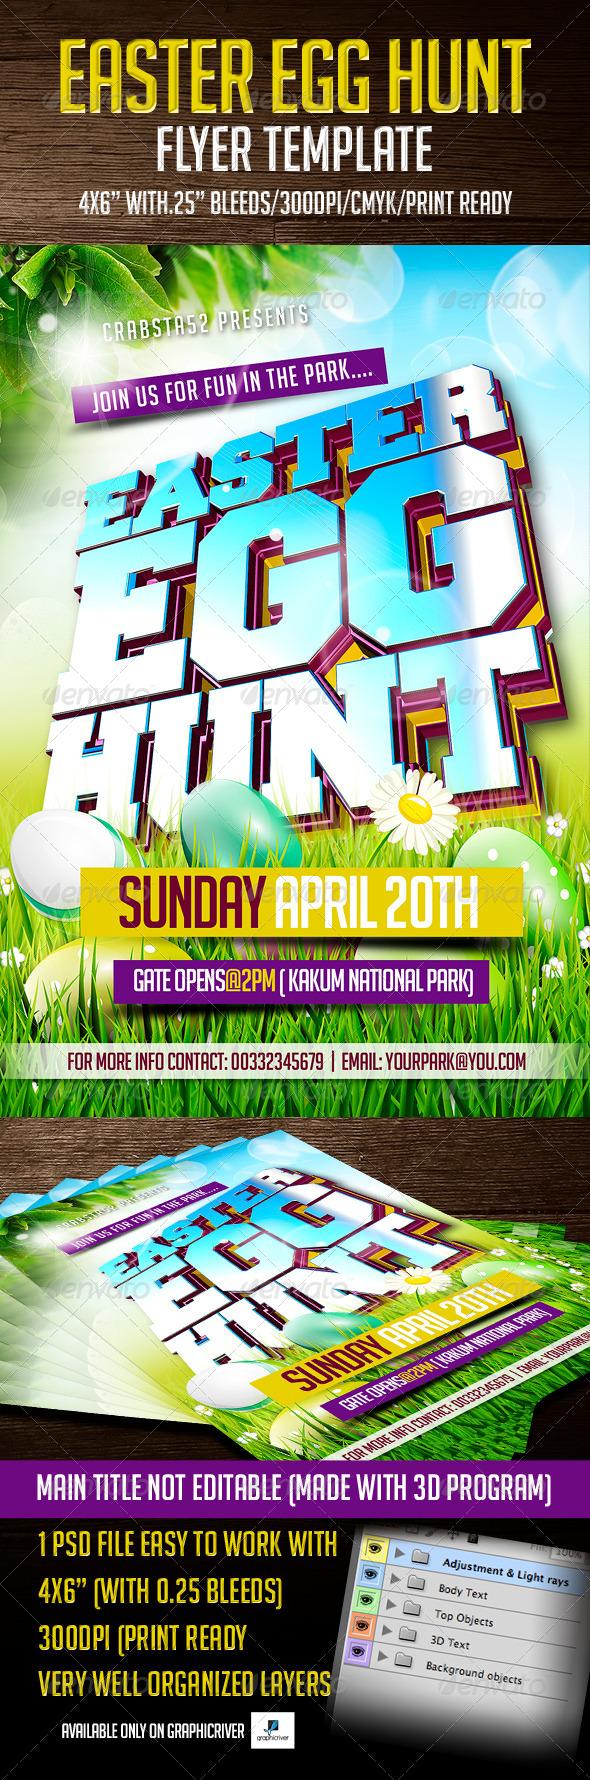 Easter Egg Hunt Flyer Template - Flyers Print Templates